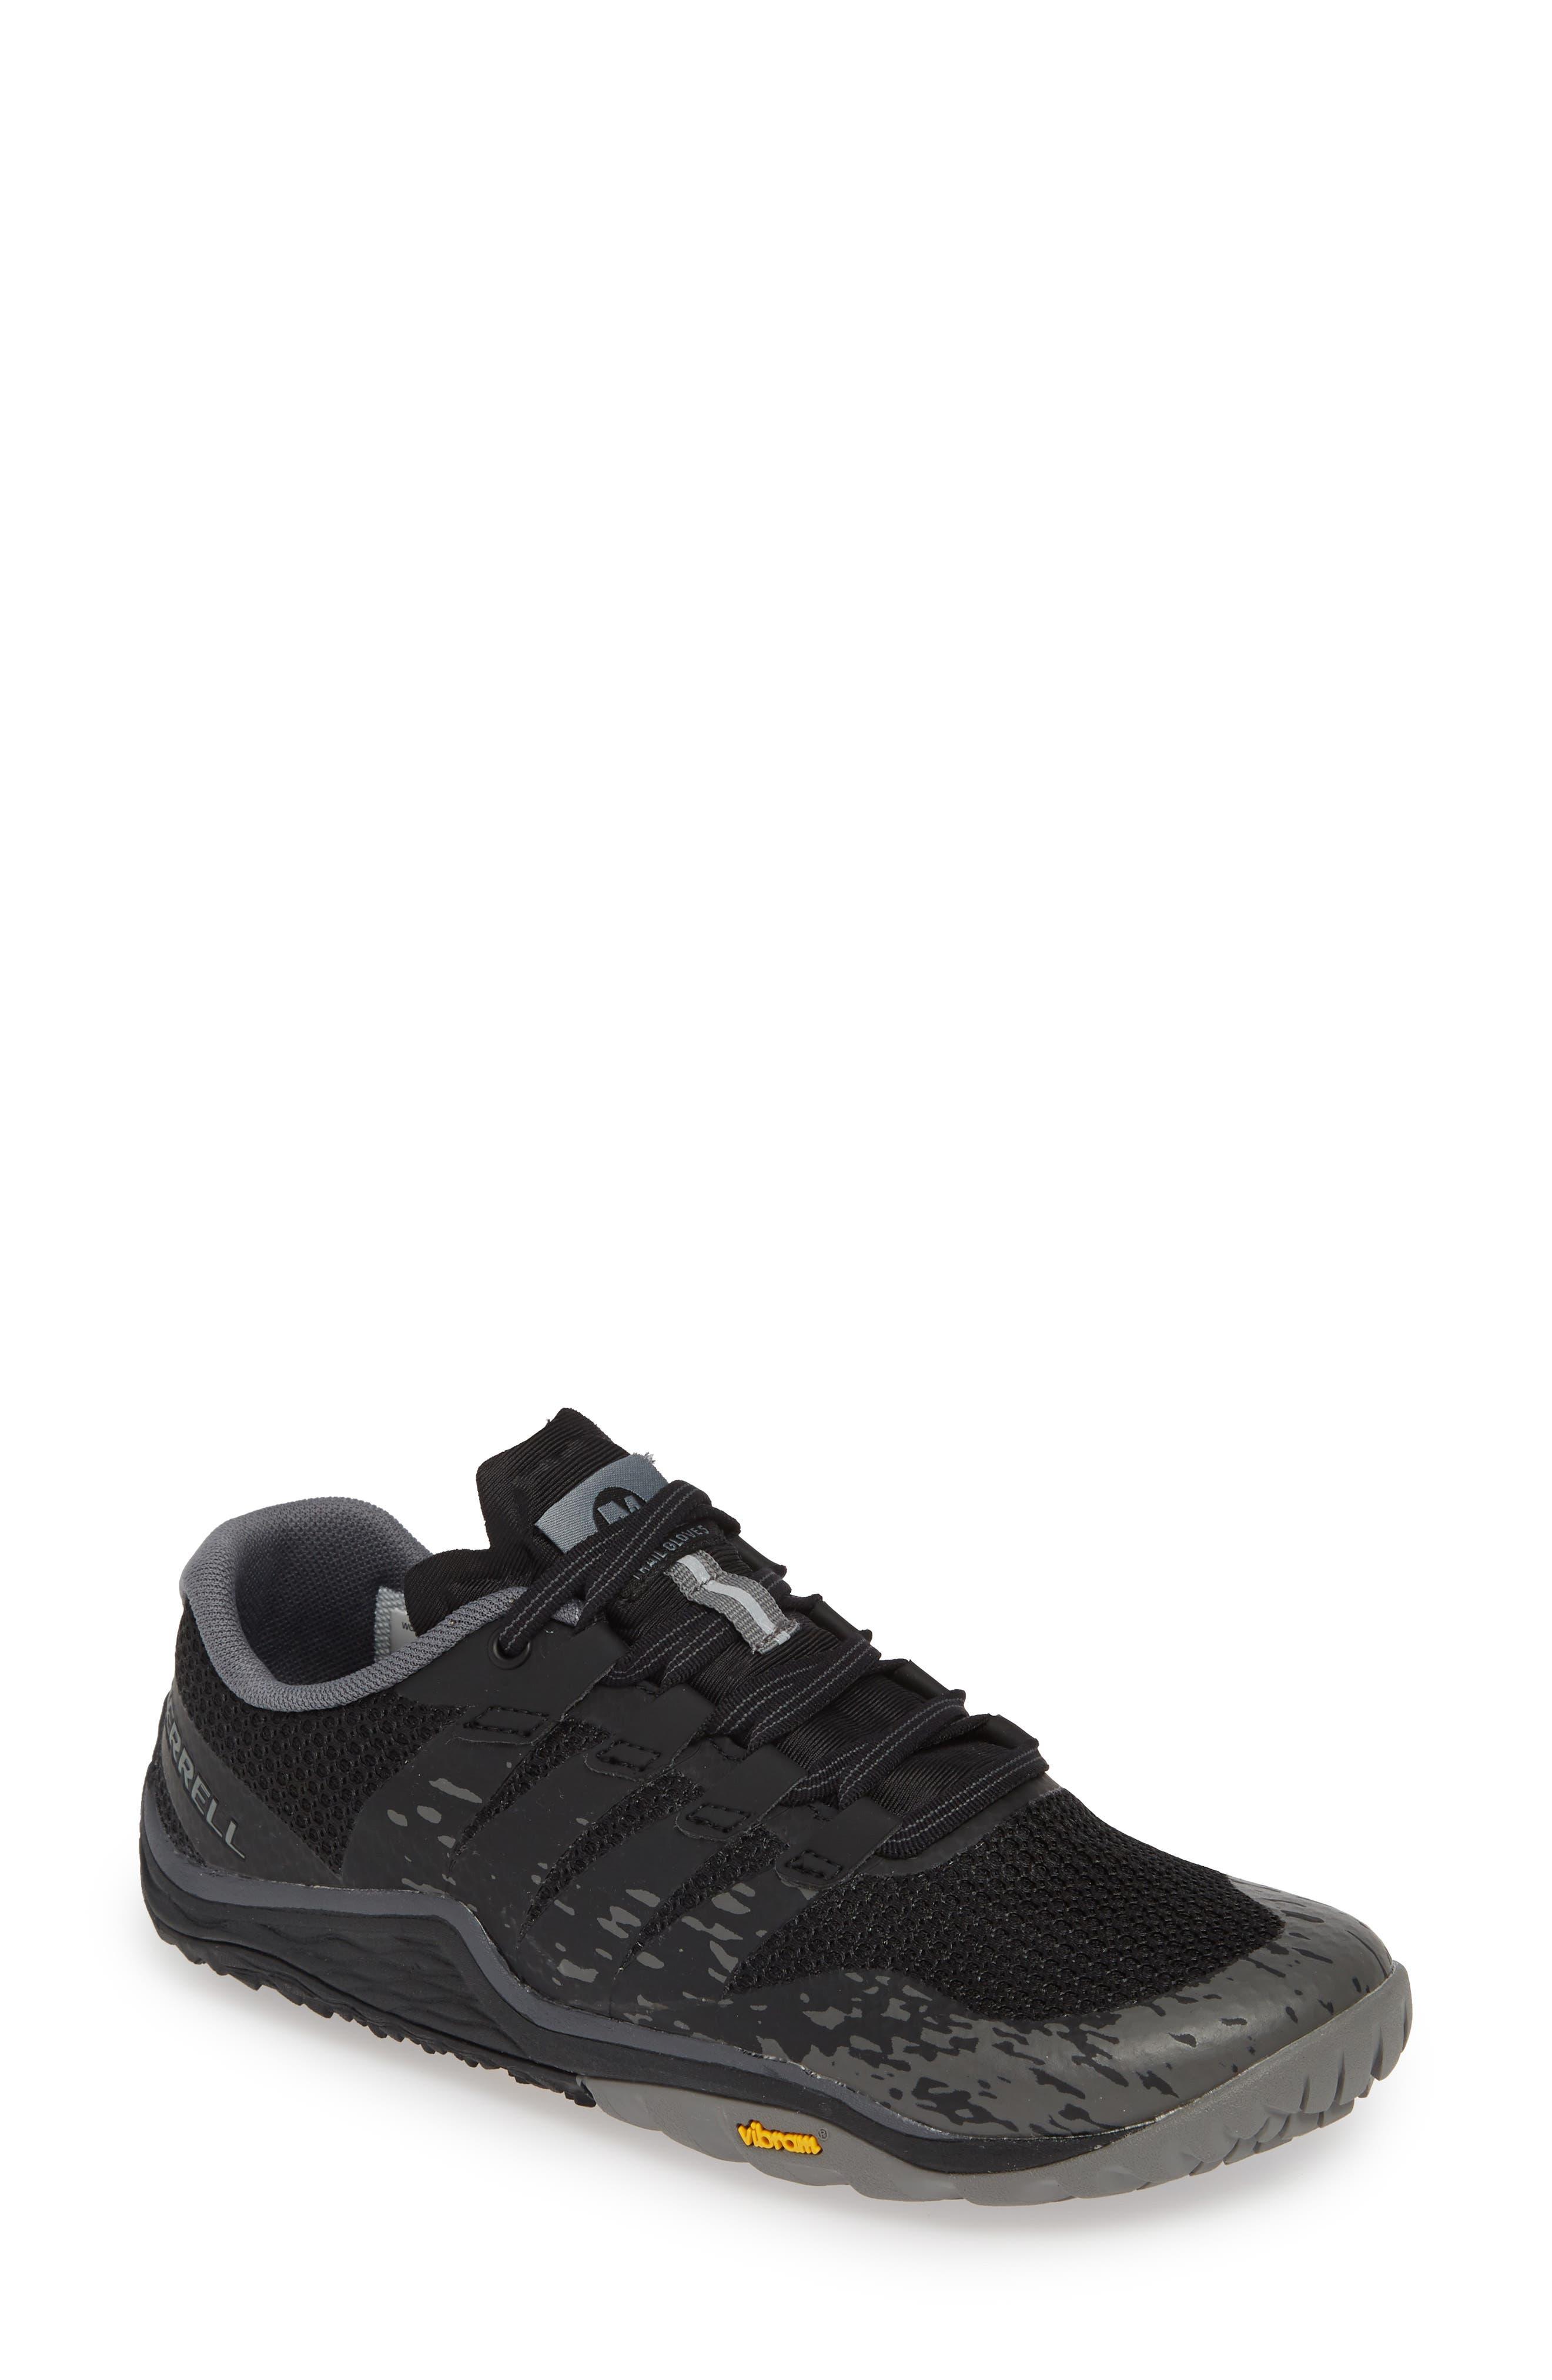 Image of Merrell Trail Glove 5 Sneaker